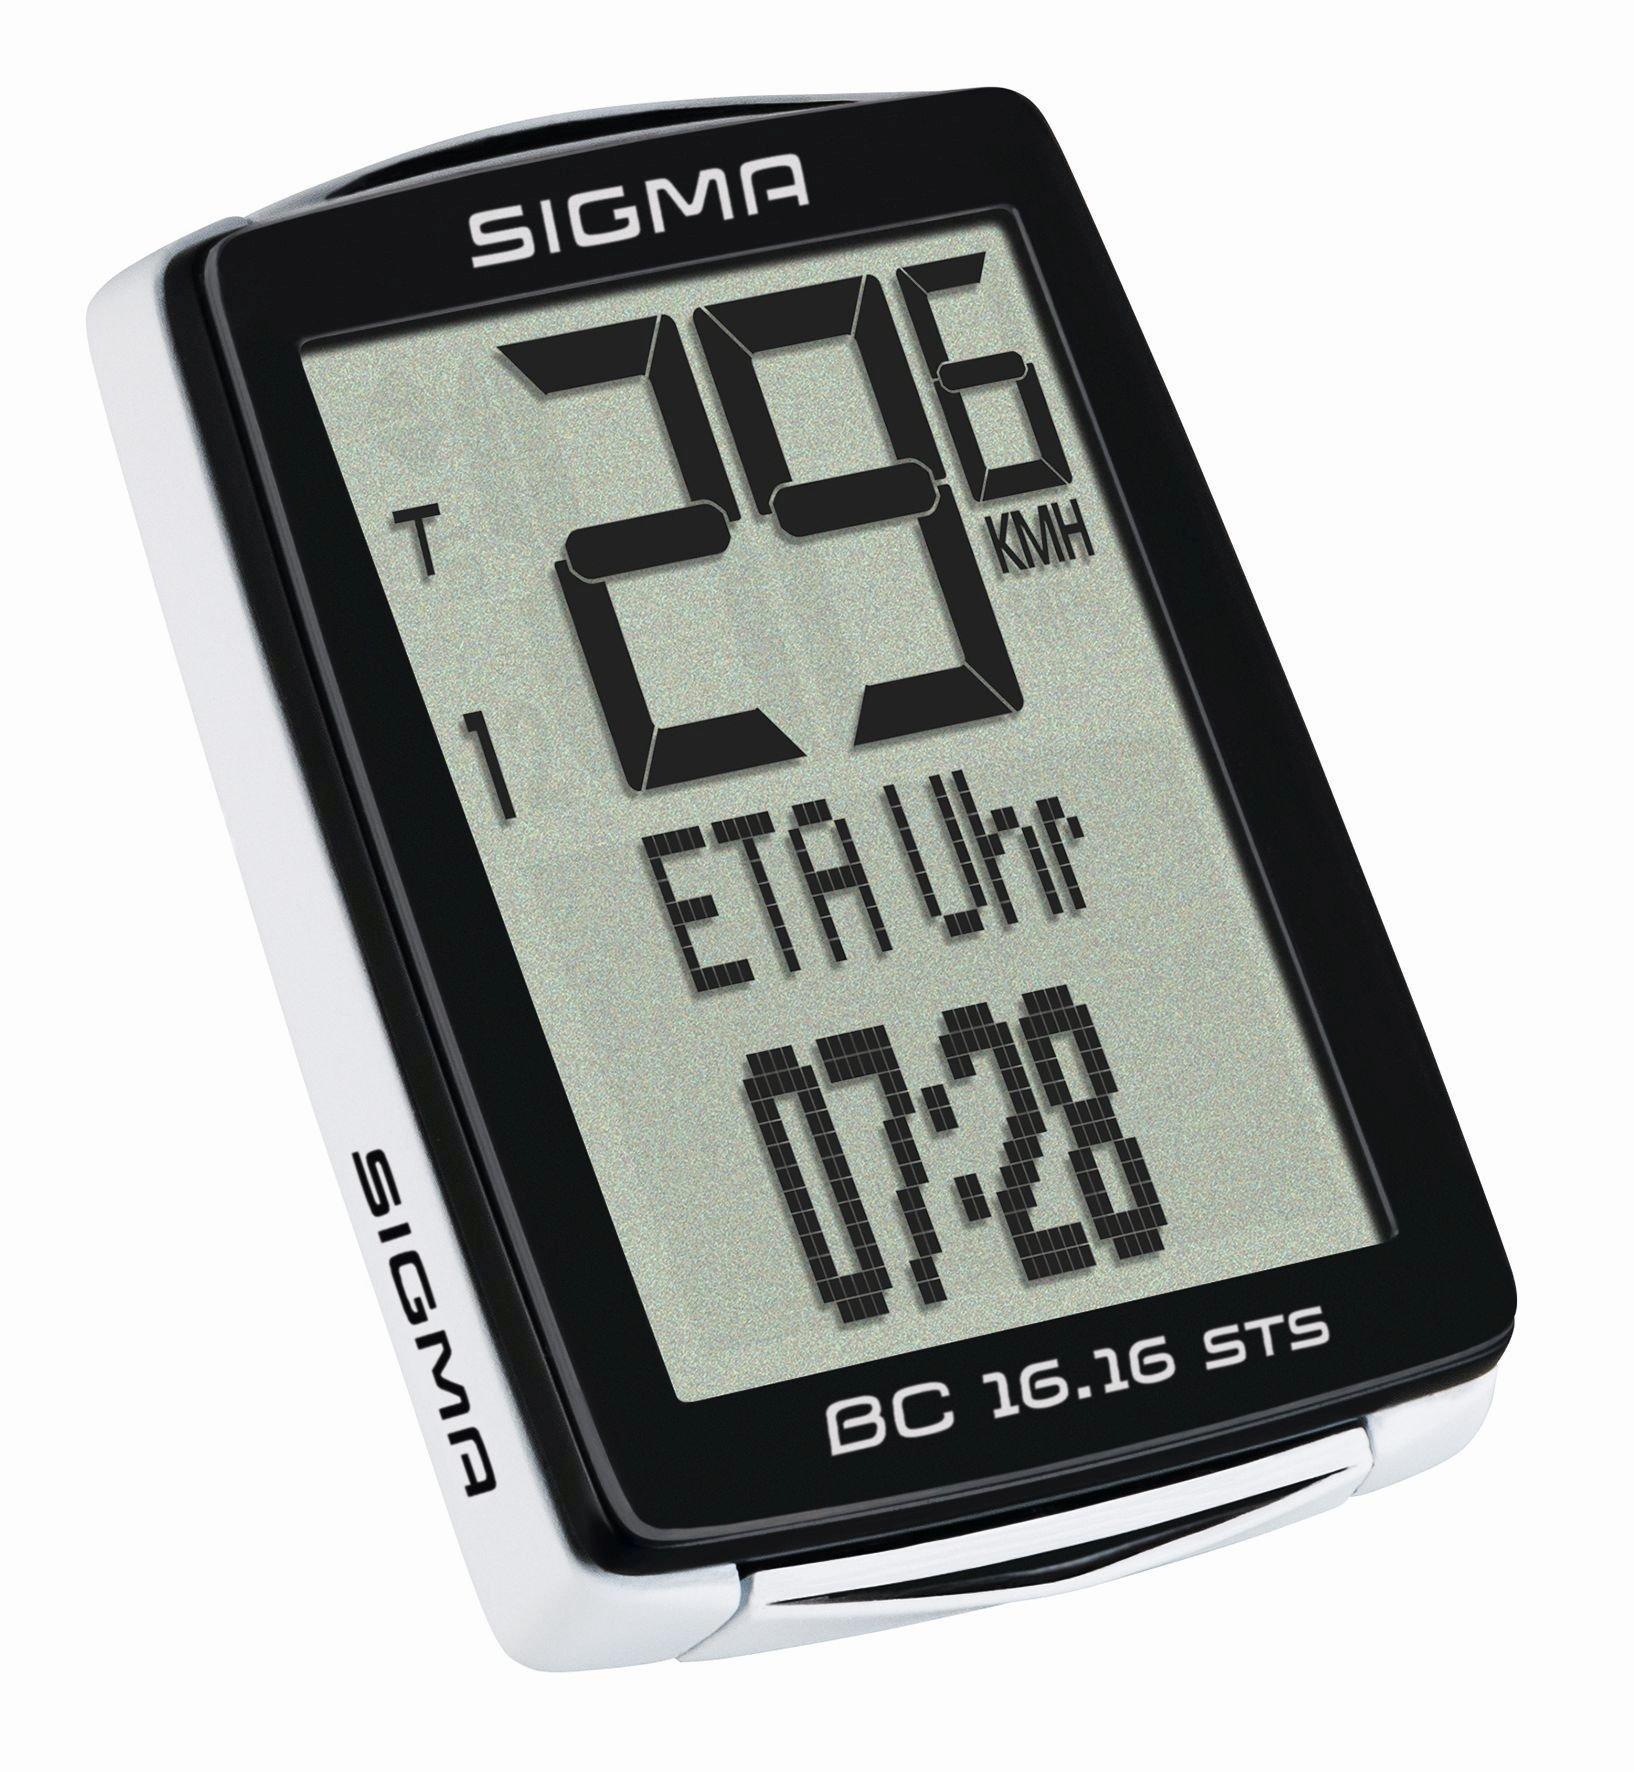 computer drahtlos: Sigma  BC 16.16 STS CAD wireless Computer